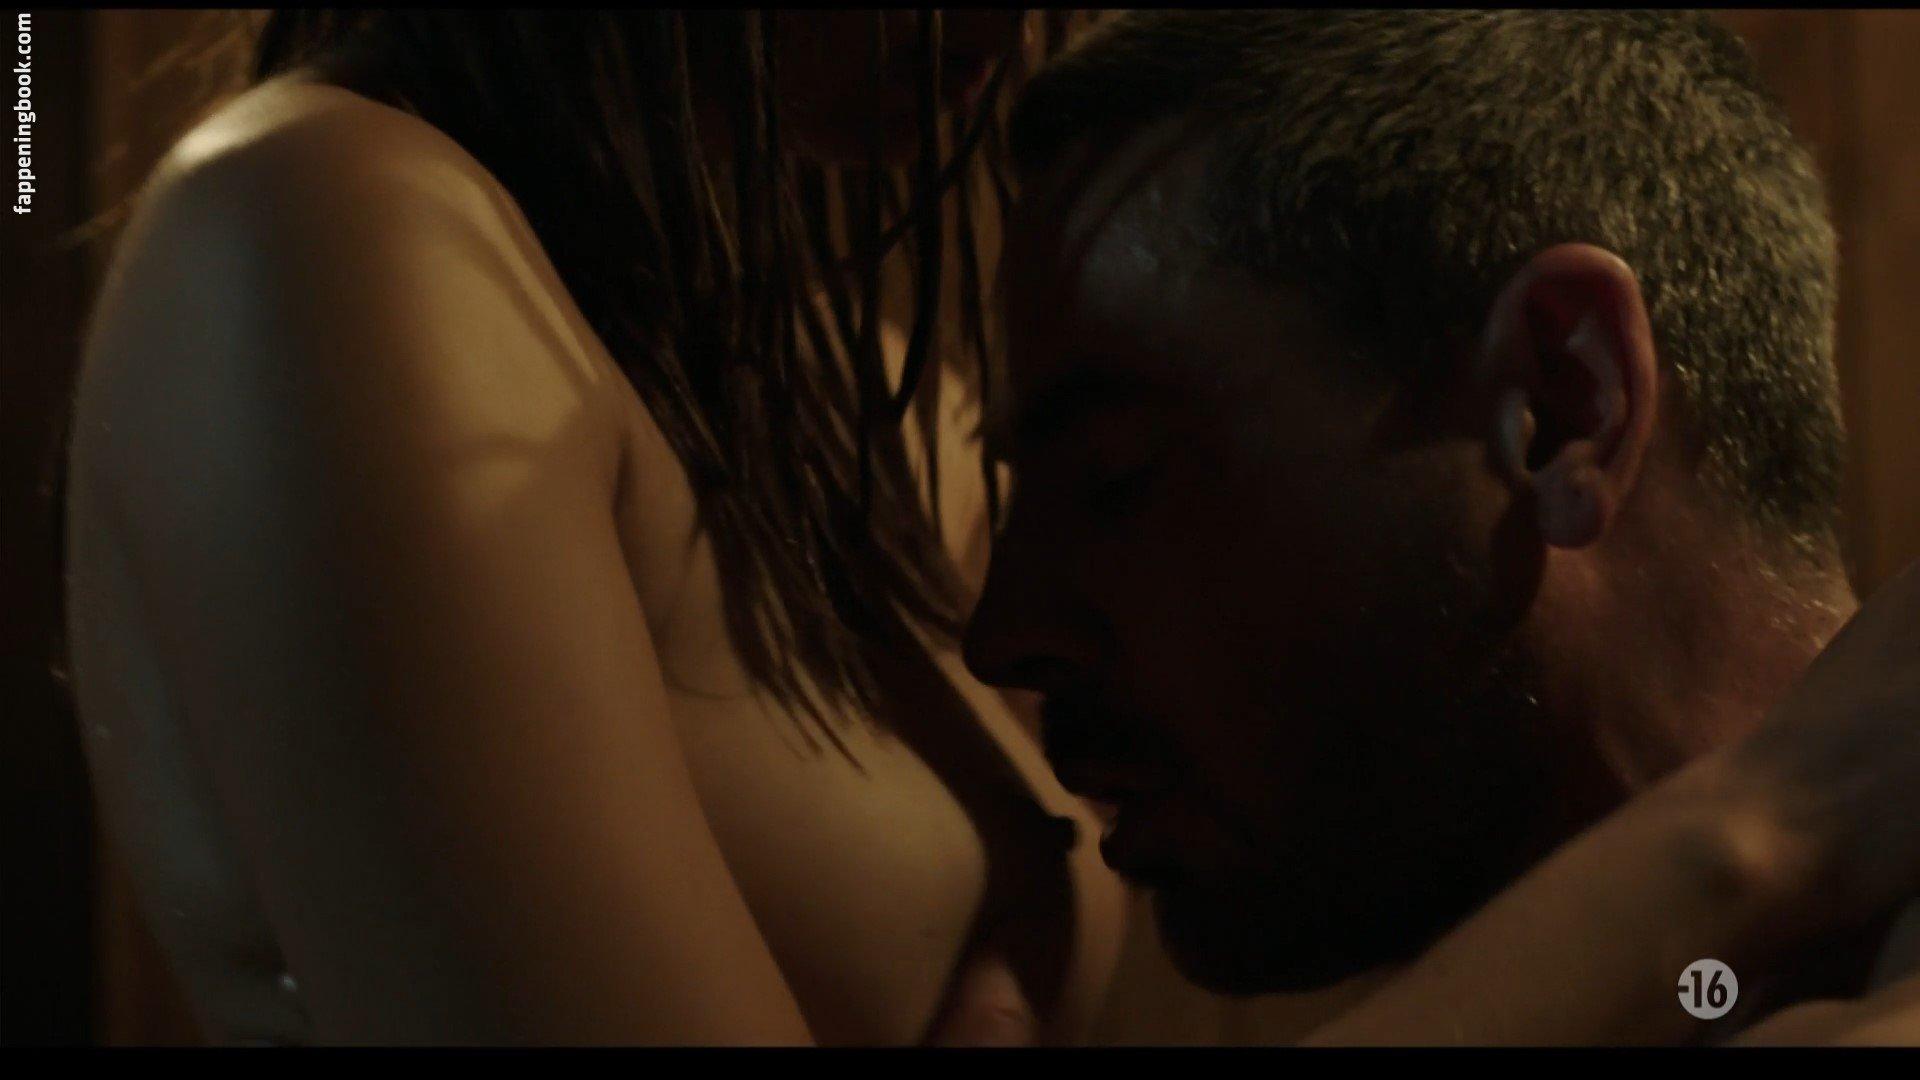 Ana Walczak Nude maud jurez nude, sexy, the fappening, uncensored - photo